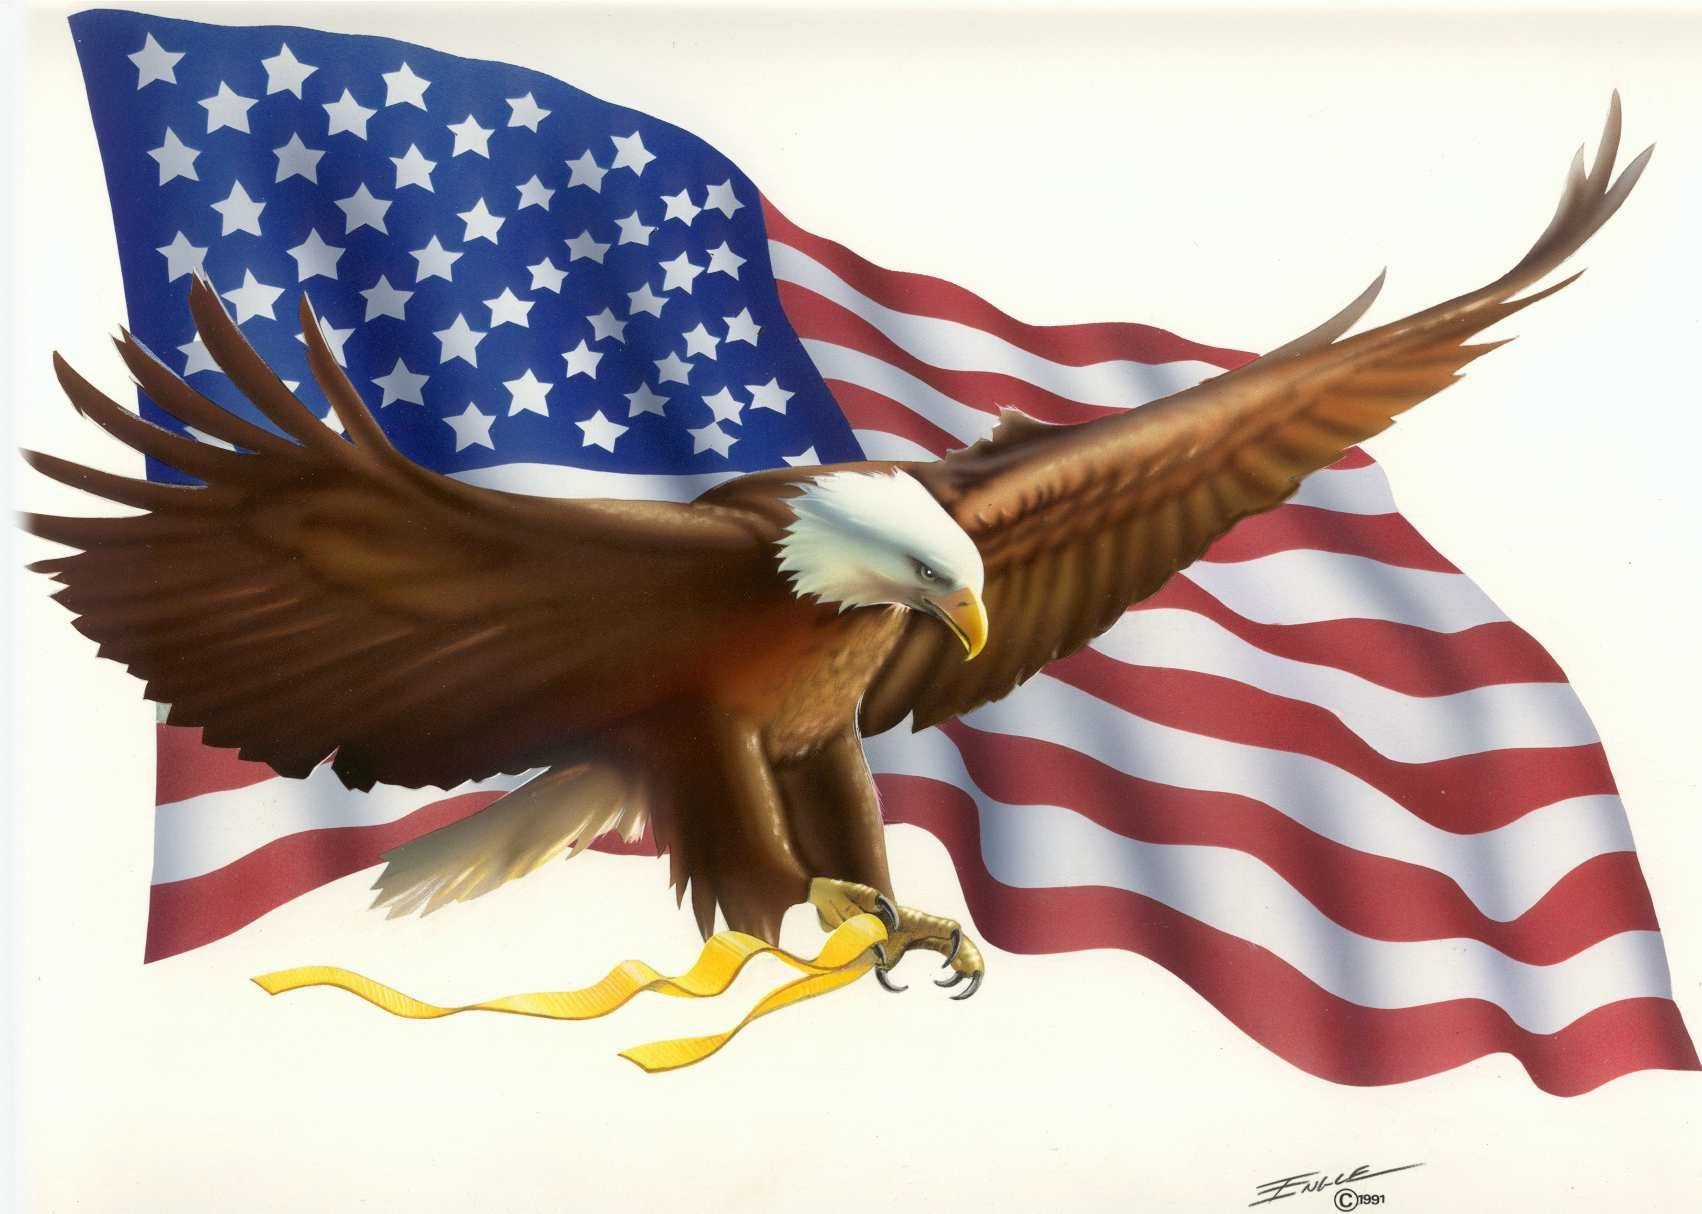 Eagle Flag Engle Bob Free Images At Clker Com Vector Clip Art E9k3so Clipart